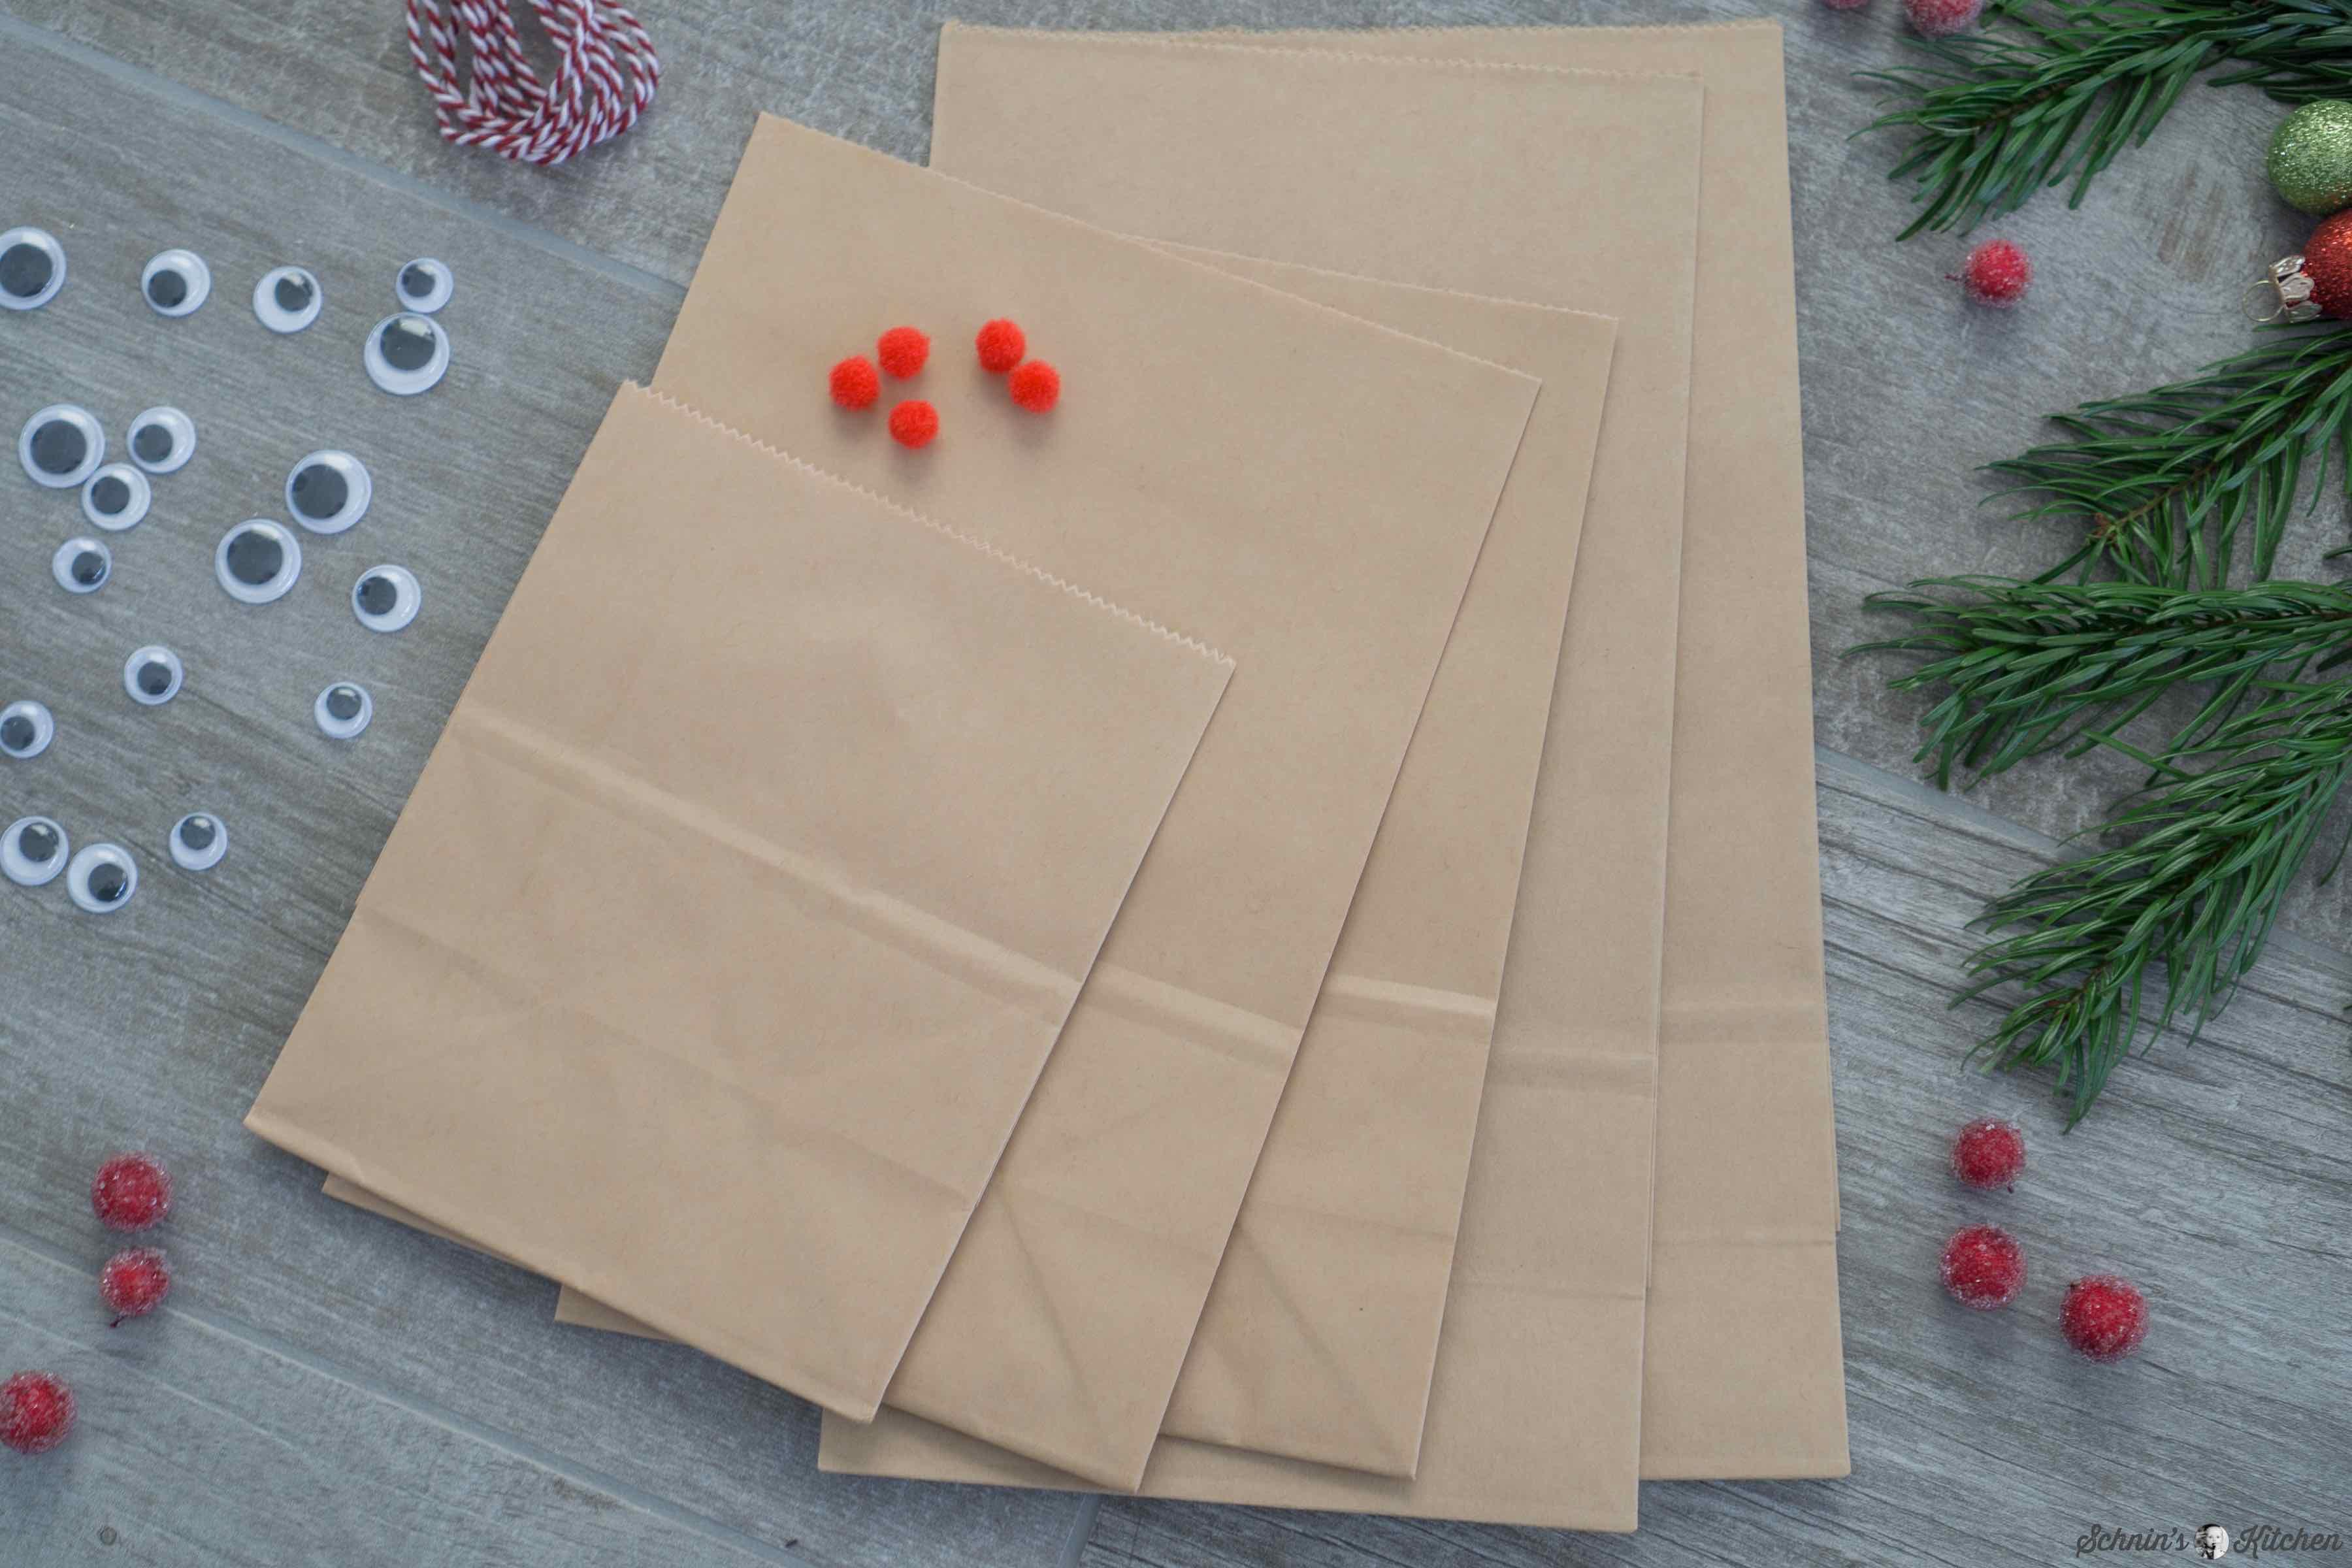 Rentier-Geschenktüten basteln zum Geschenke verpacken | www.schninskitchen.de